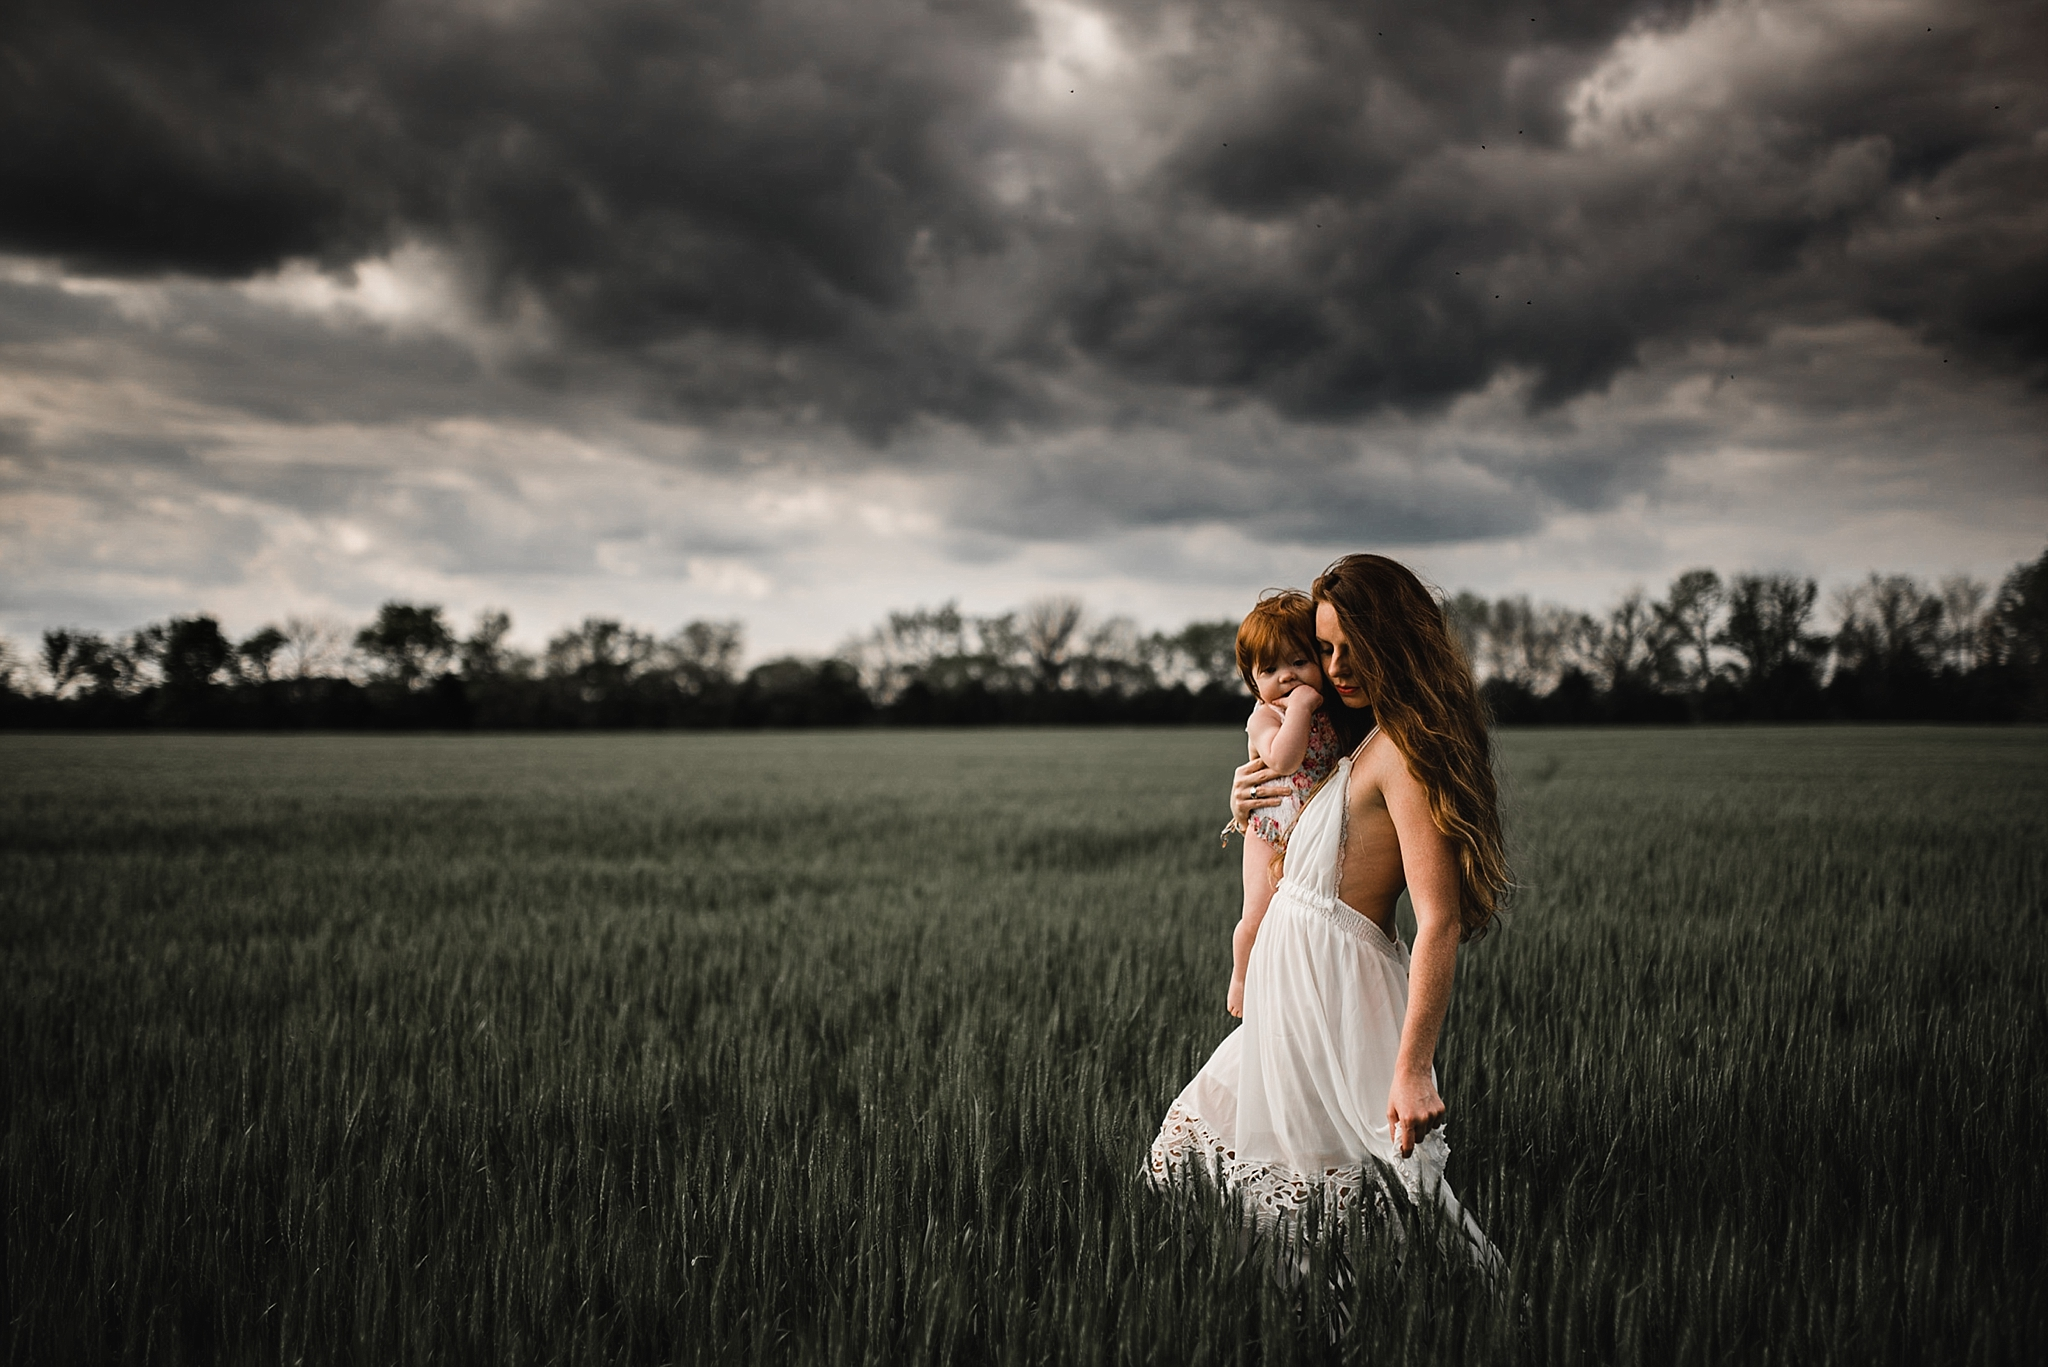 twyla jones photography - mother daughter - field and forest-4363_treasure coast florida.jpg